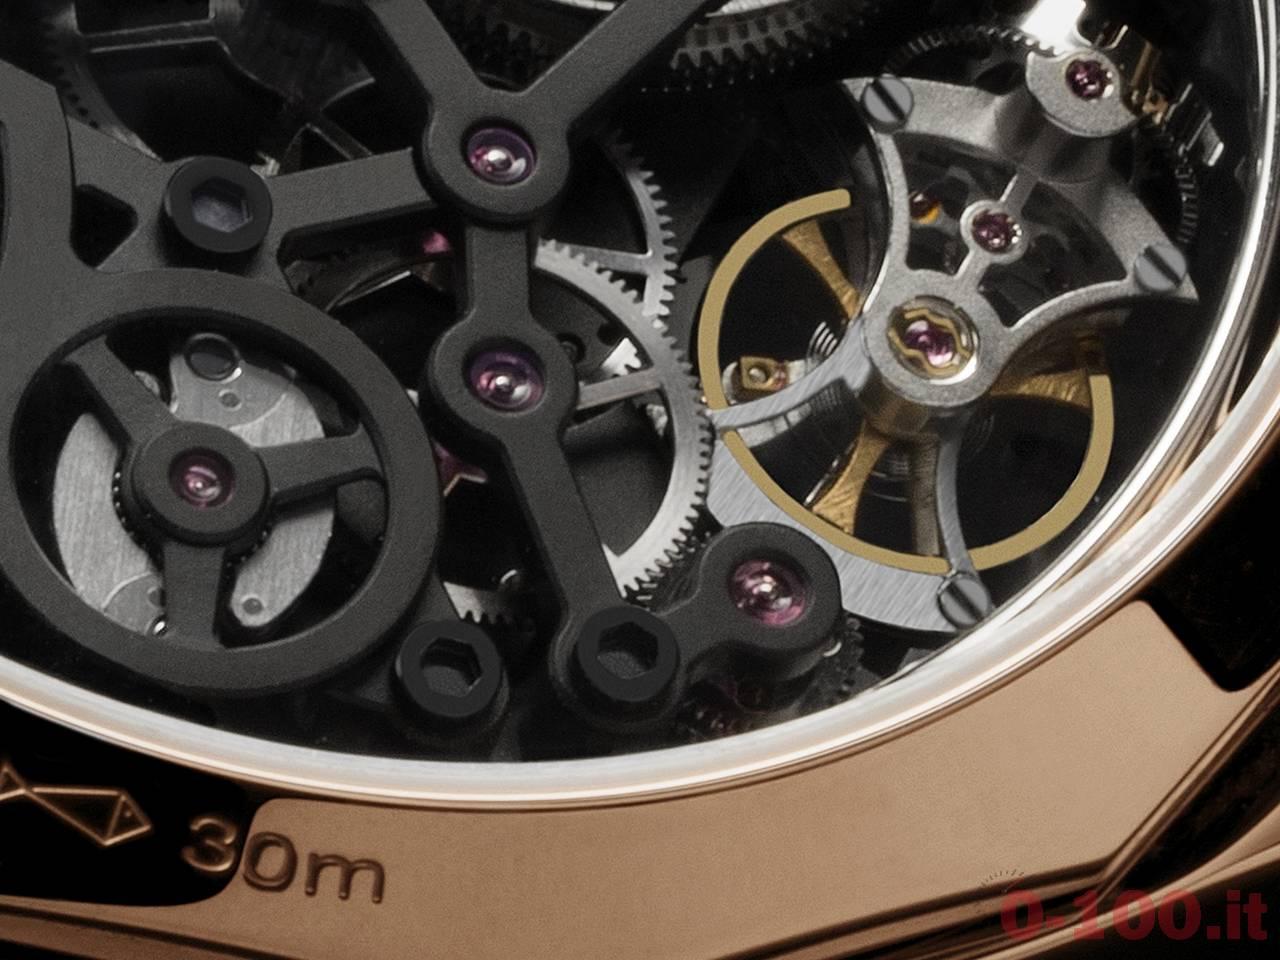 officine-panerai-radiomir-1940-minute-repeater-carillon-tourbillon-gmt-pam00600_0-10021